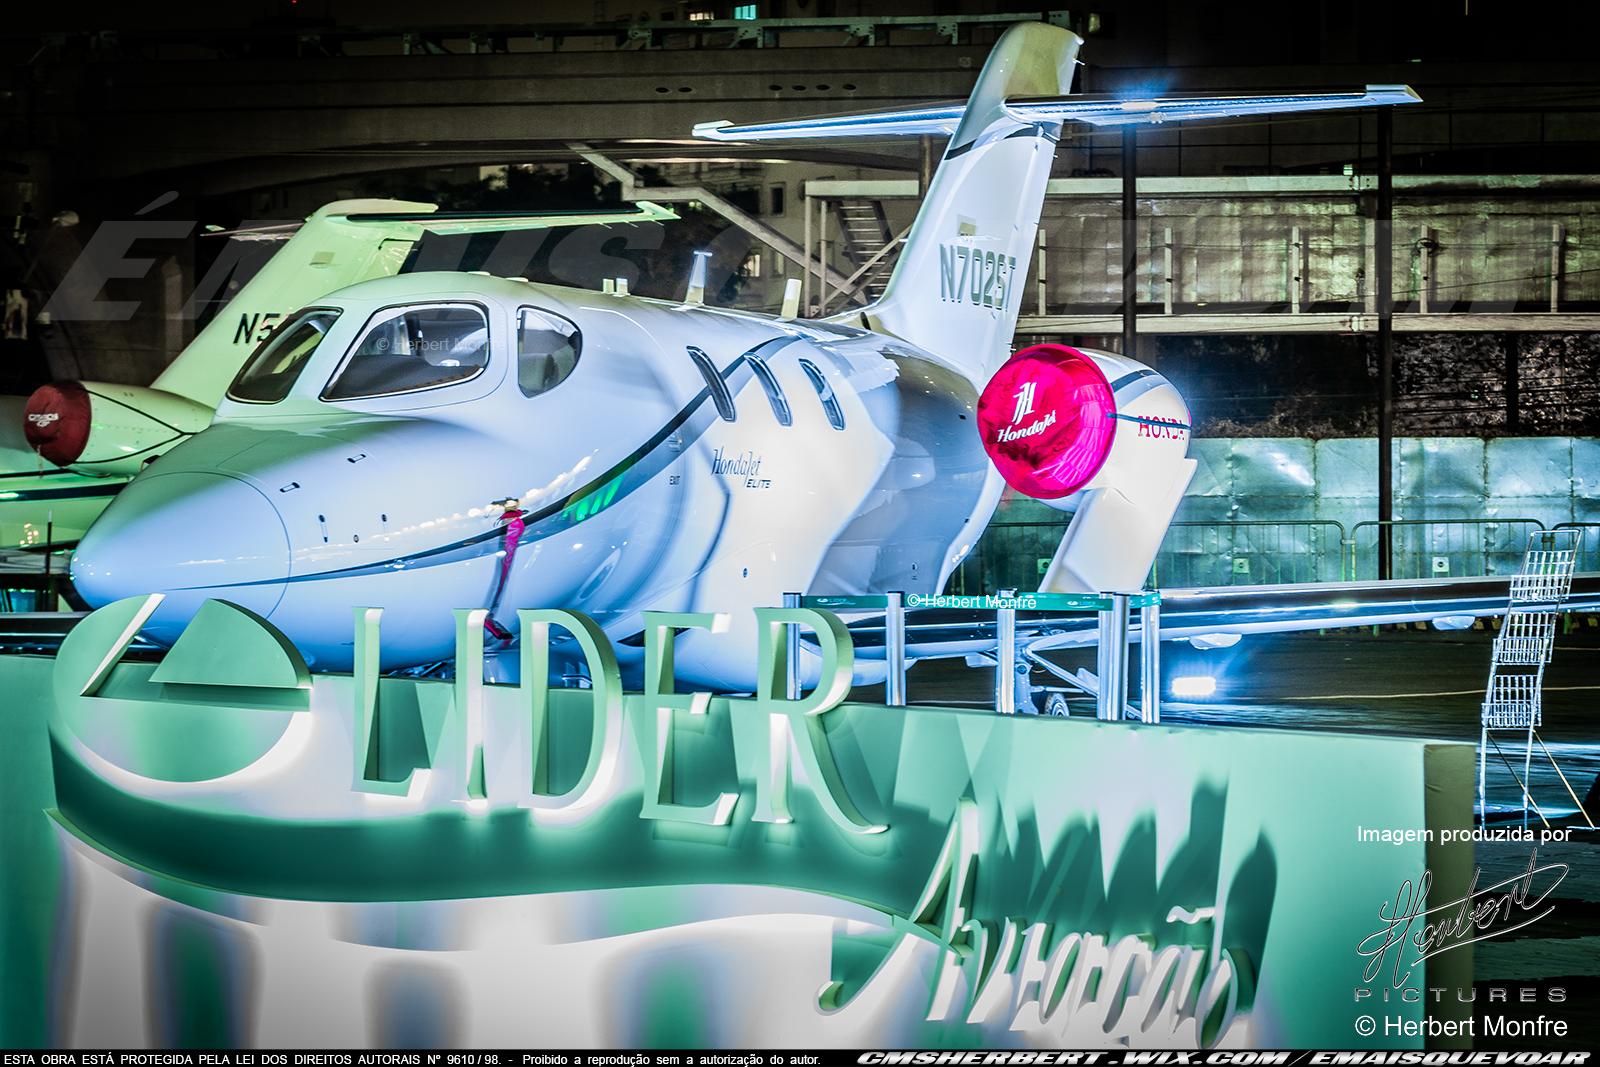 Honda Jet Elite | N702ST | Foto © Herbert Monfre - Contrate o fotógrafo em cmsherbert@hotmail.com | by É MAIS QUE VOAR | LABACE 2019